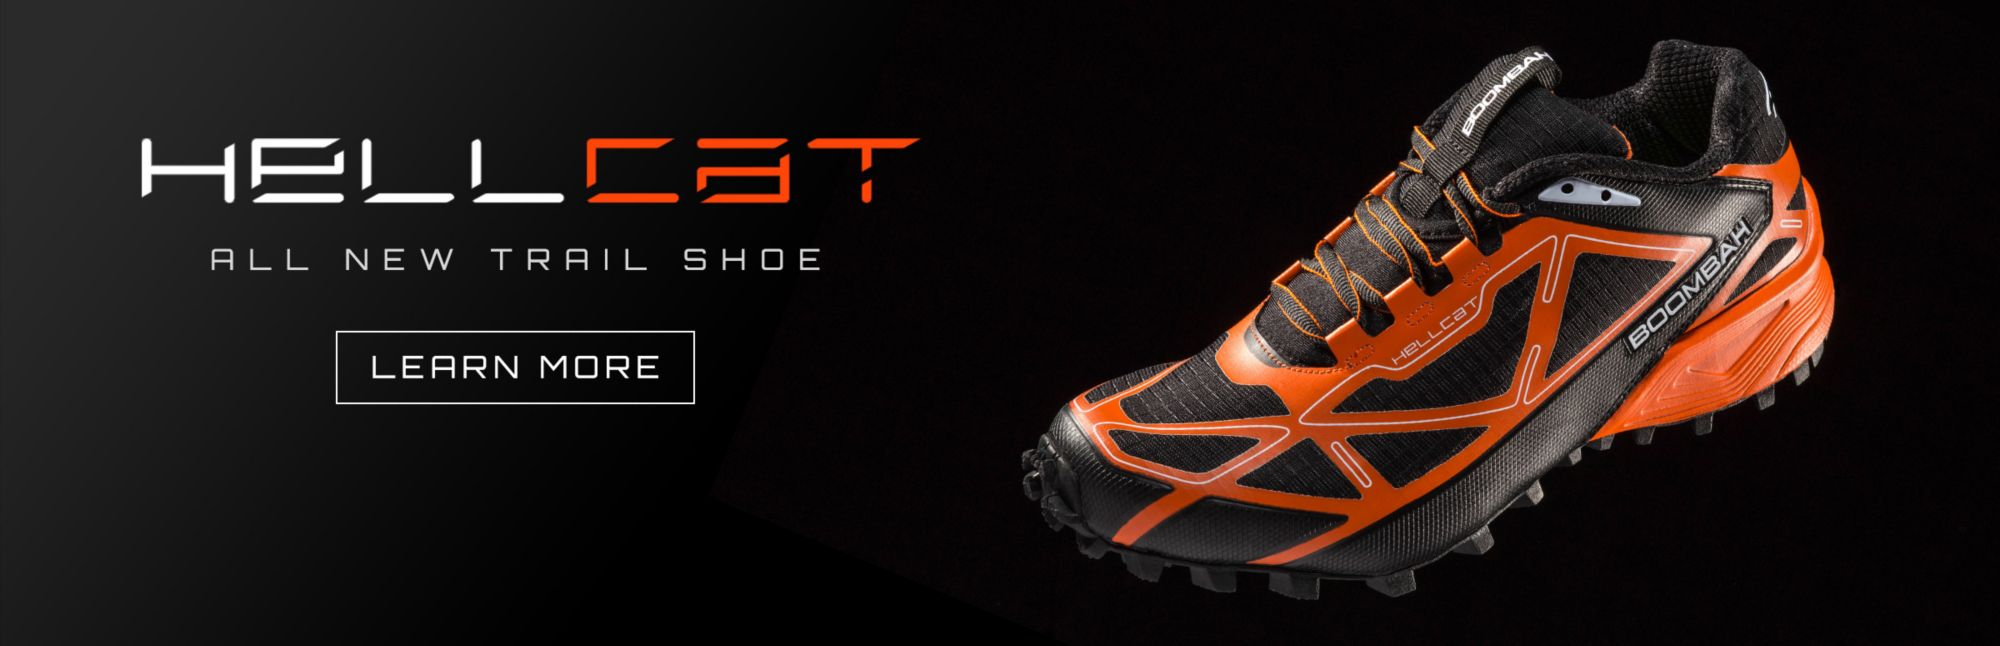 Boombah Hellcat Trail Shoe